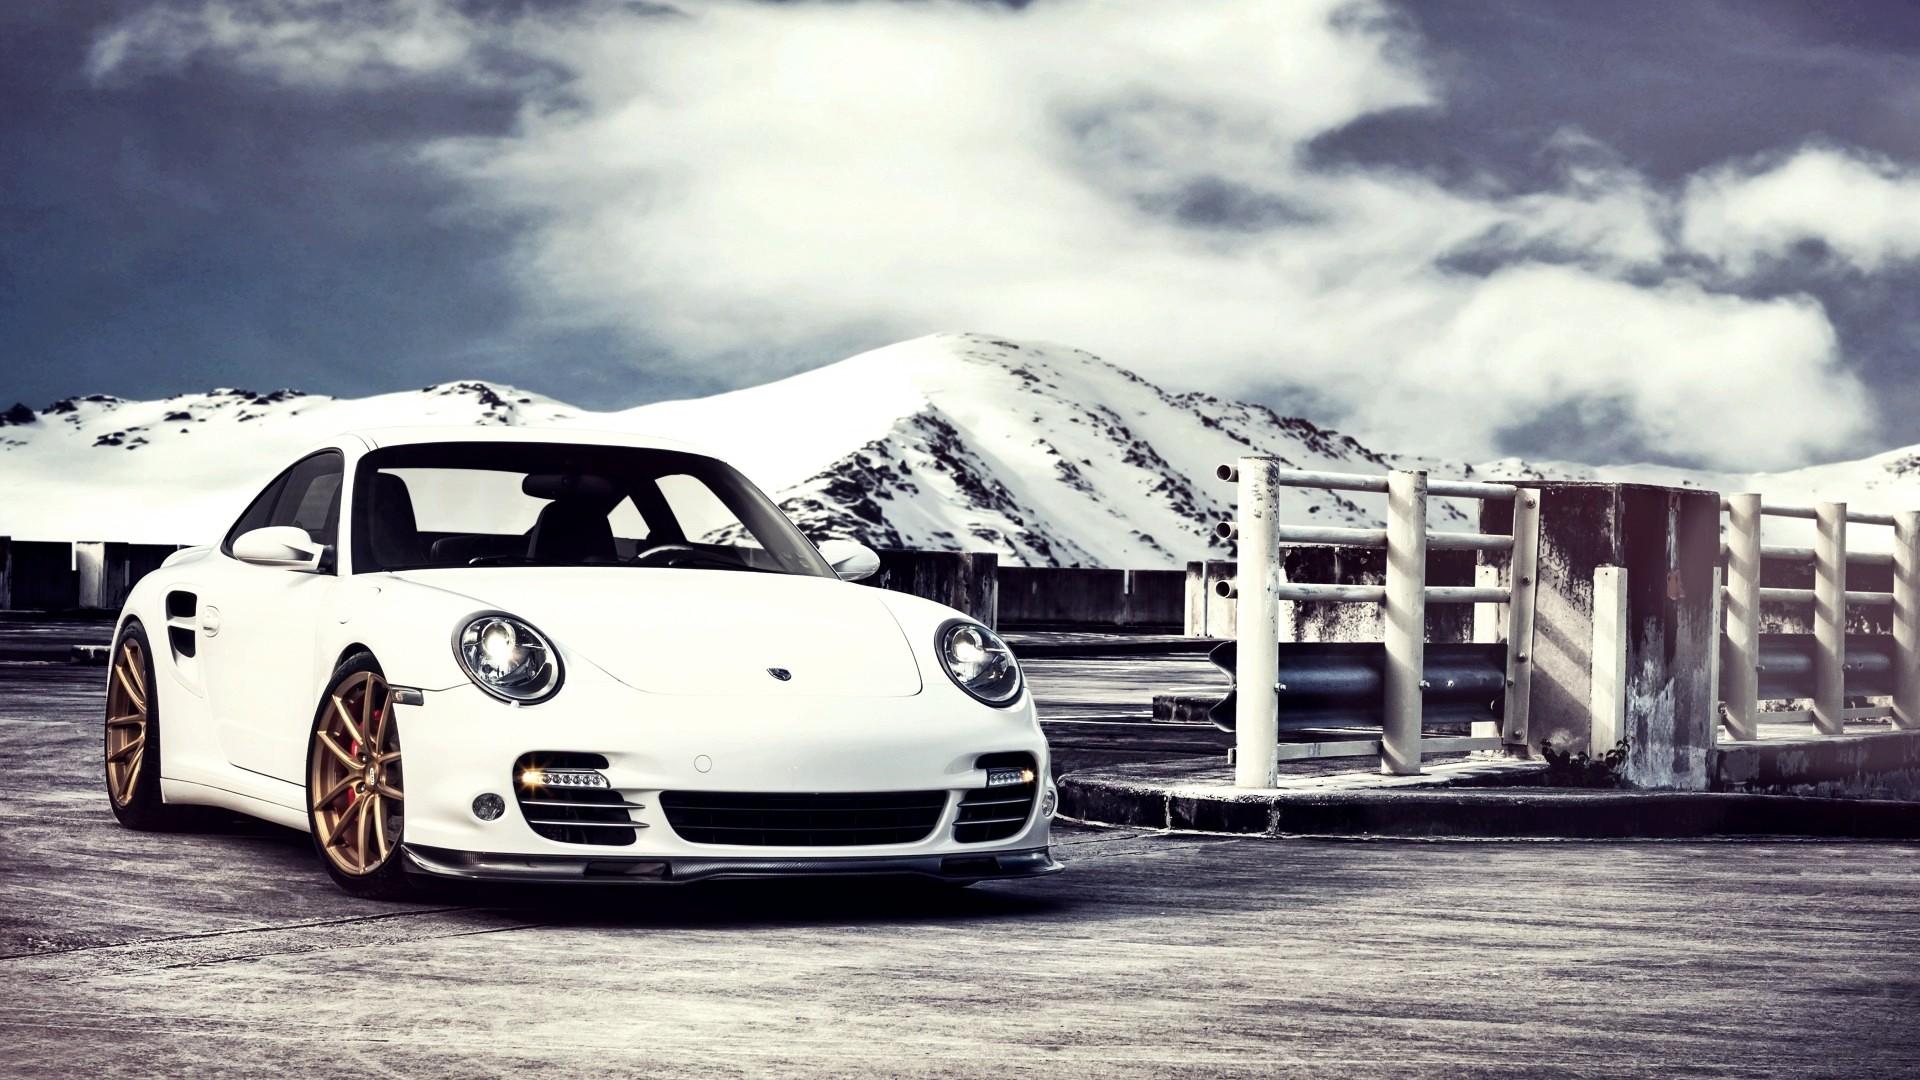 Cool Cars Drifting Wallpapers Hd 15 Excellent Hd Porsche Wallpapers